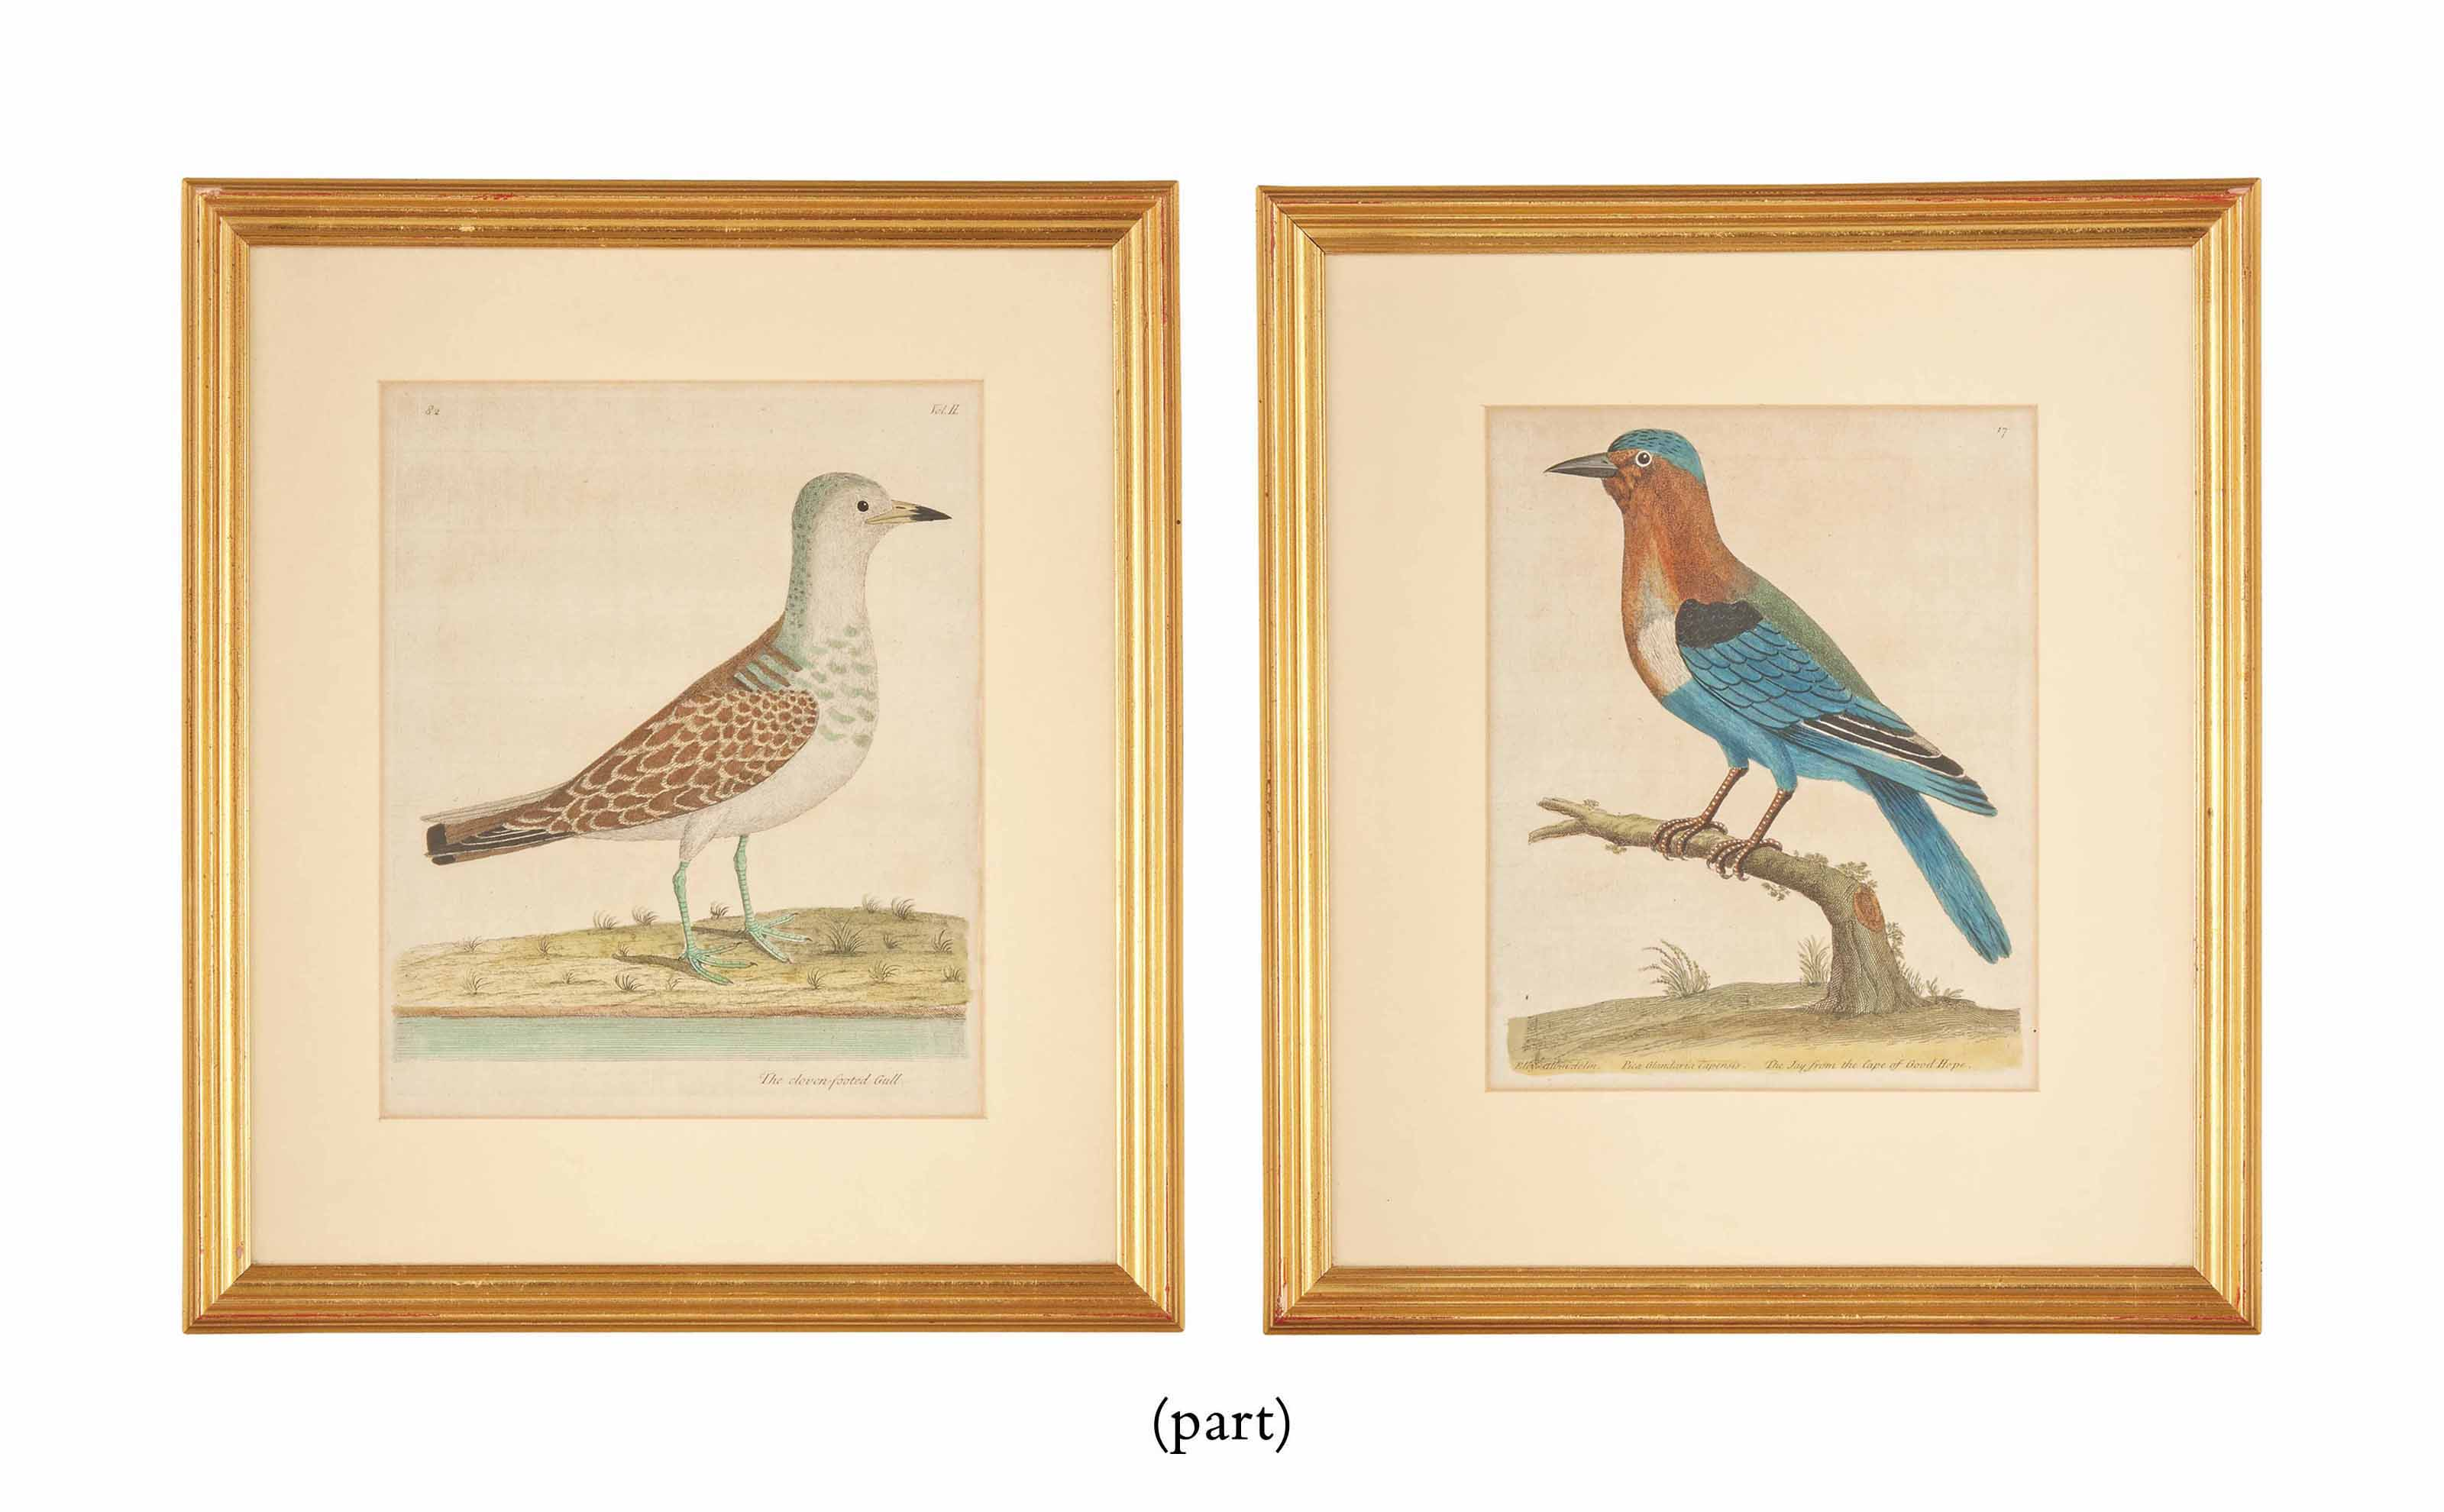 SIXTEEN COLOURED ENGRAVINGS OF BIRDS